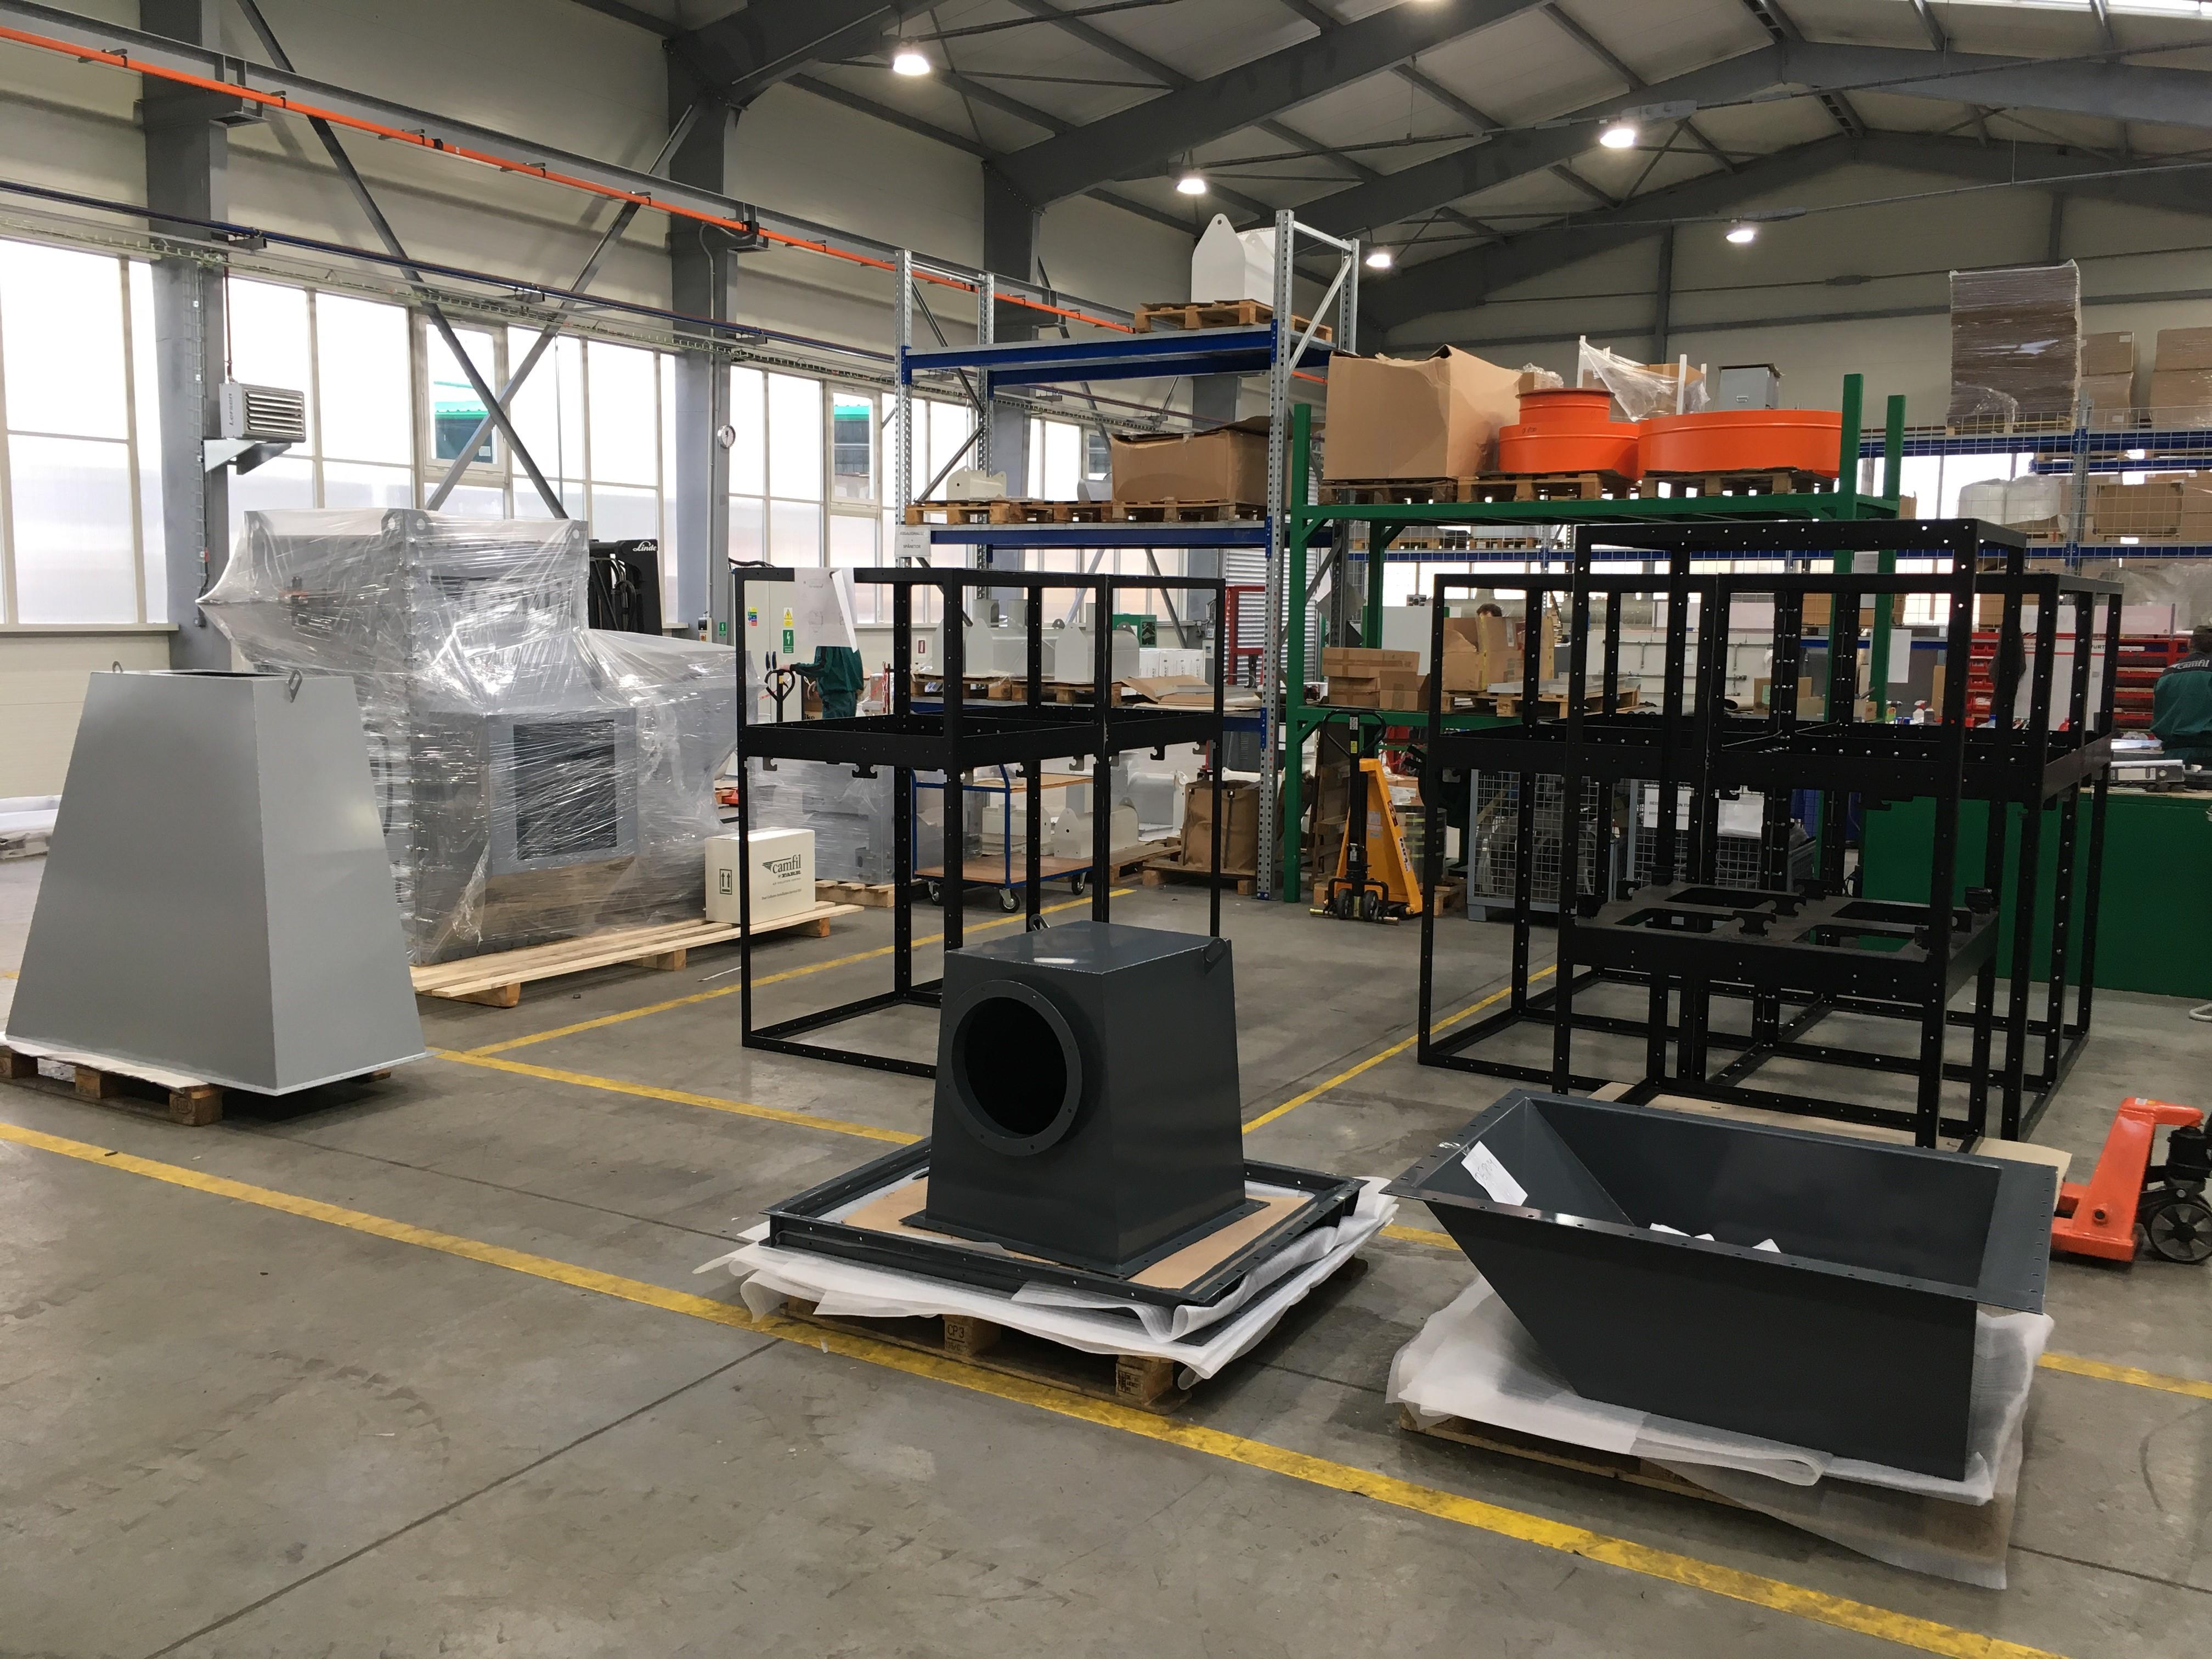 Camfil APC GmbH